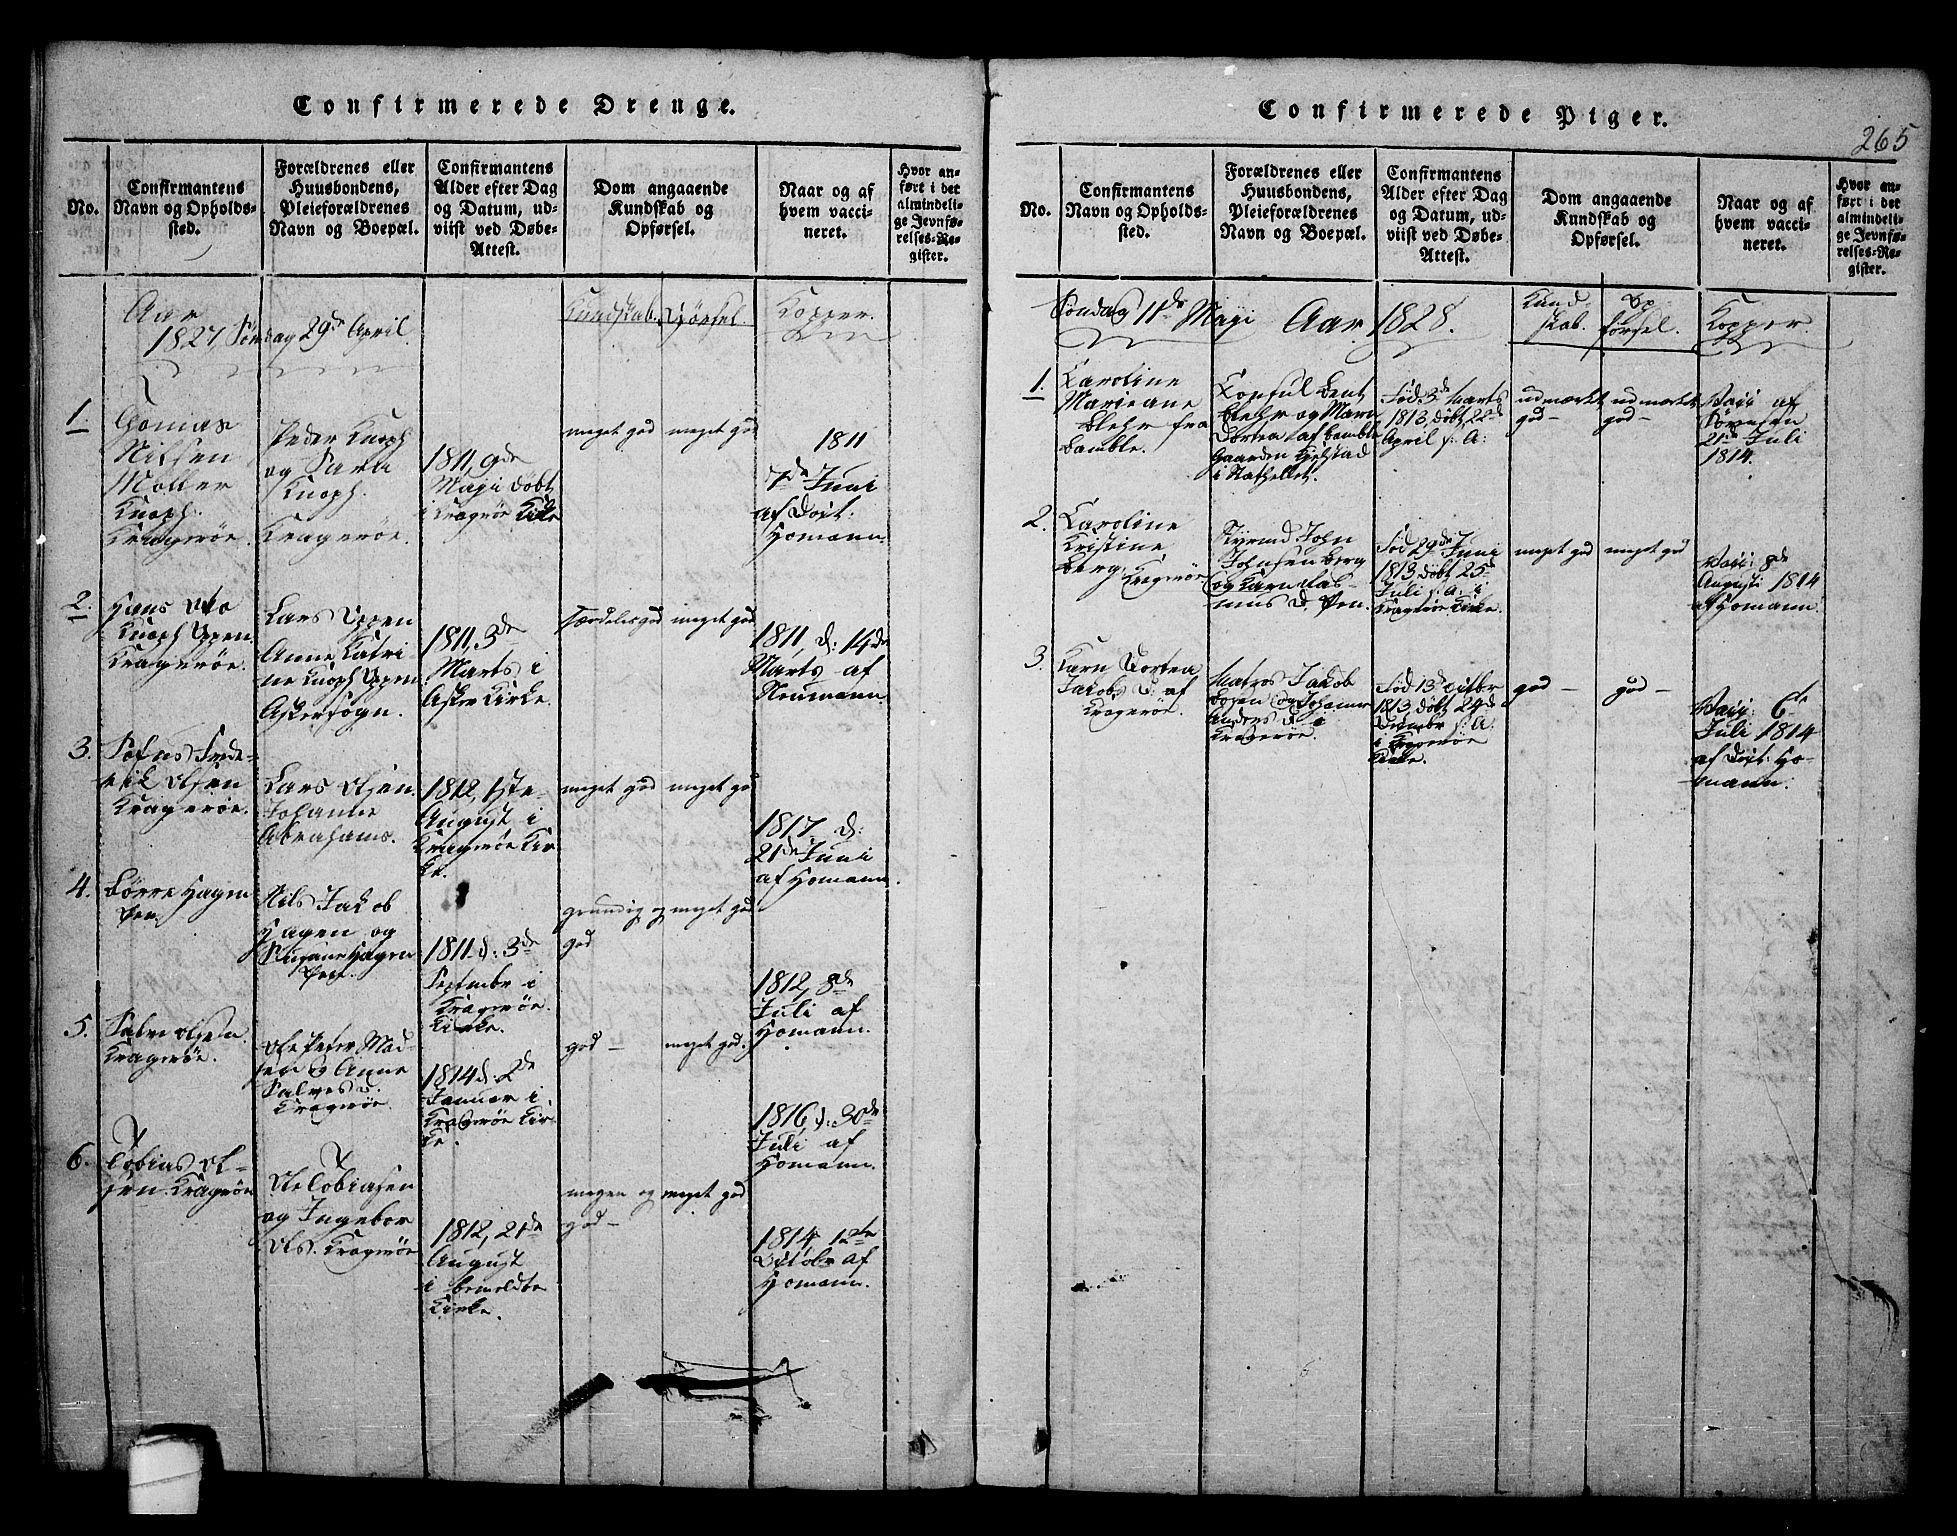 SAKO, Kragerø kirkebøker, F/Fa/L0004: Ministerialbok nr. 4, 1814-1831, s. 265